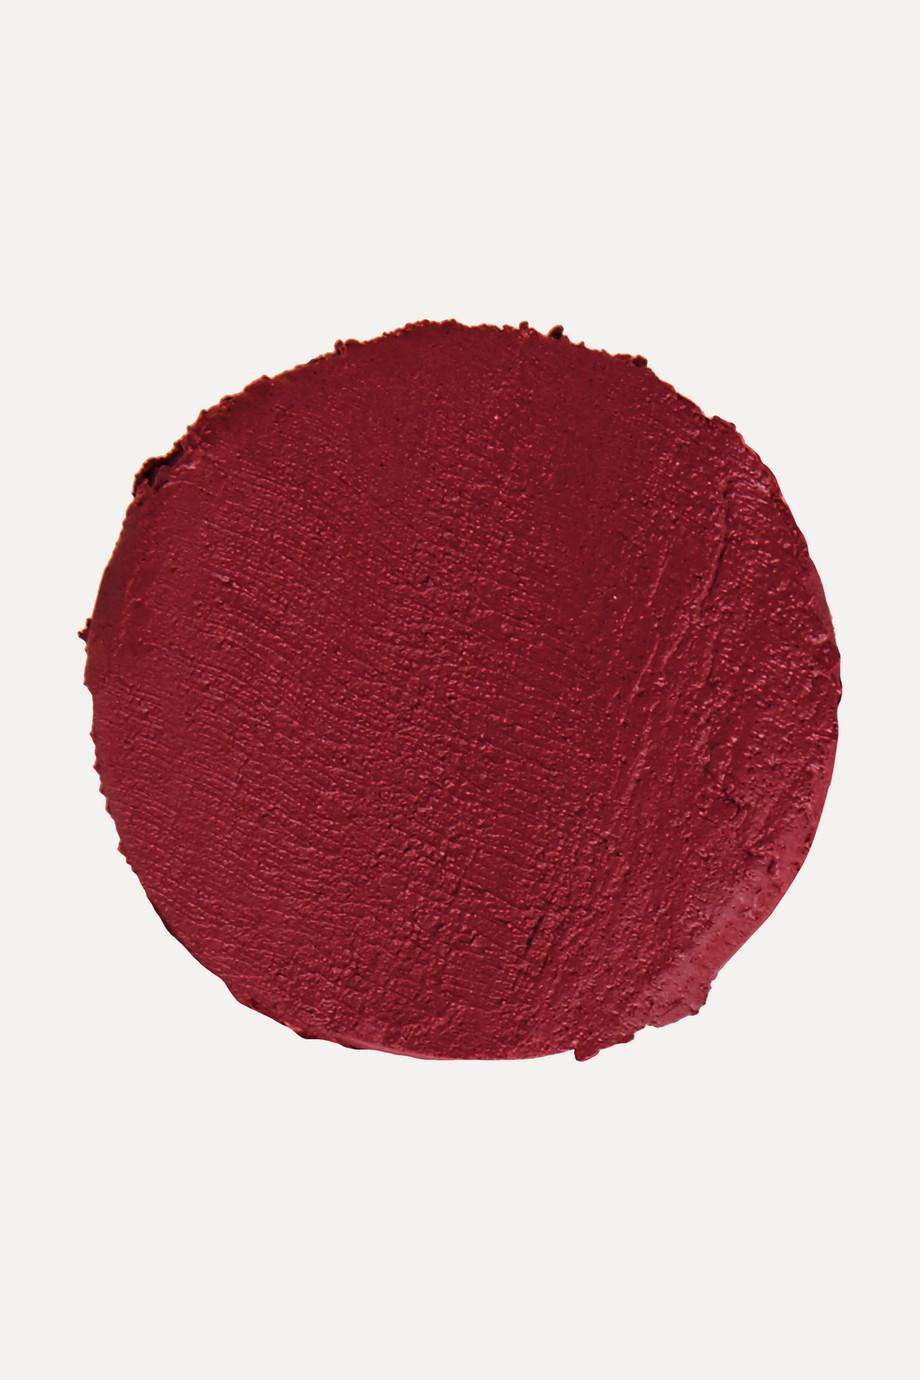 RMS Beauty Wild With Desire Lipstick – Jezebel – Lippenstift